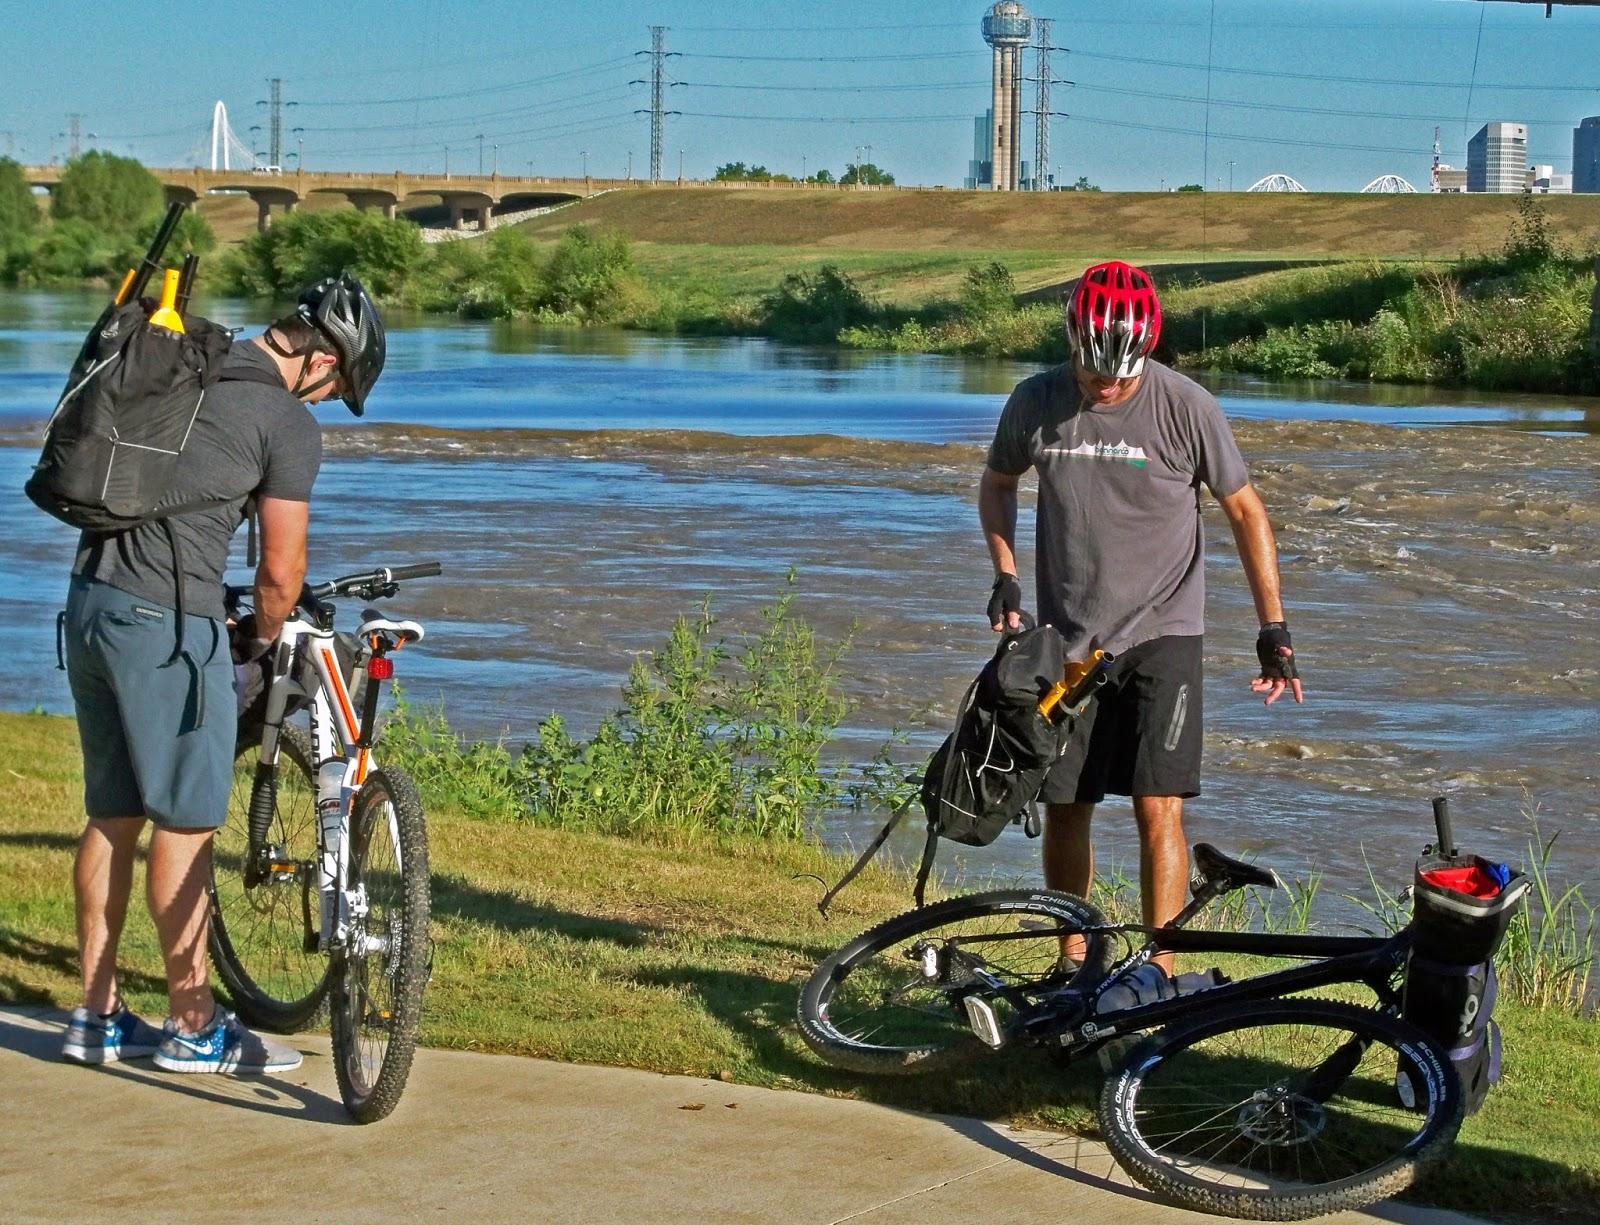 Dallas Trinity Trails Packrafting The Trinity River Paddling